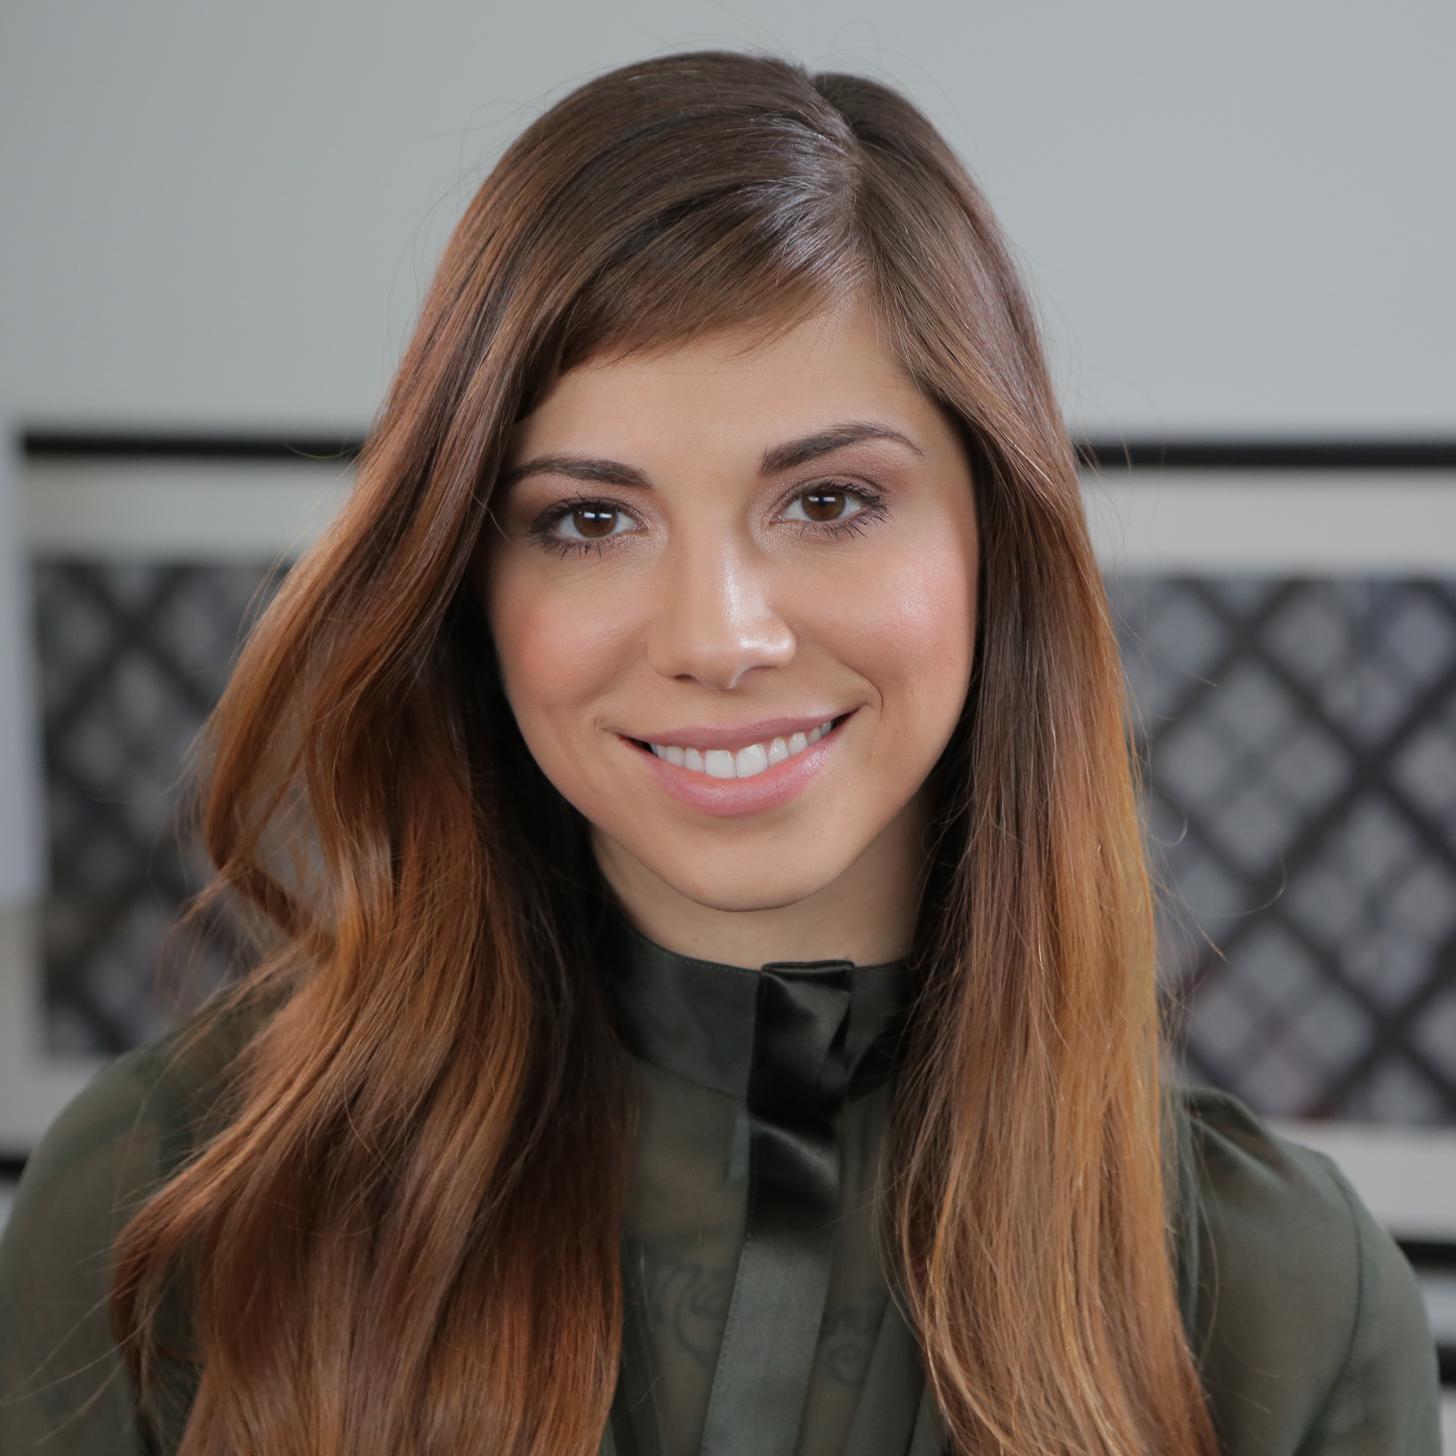 Singer-songwriter Christina Perri - age: 34